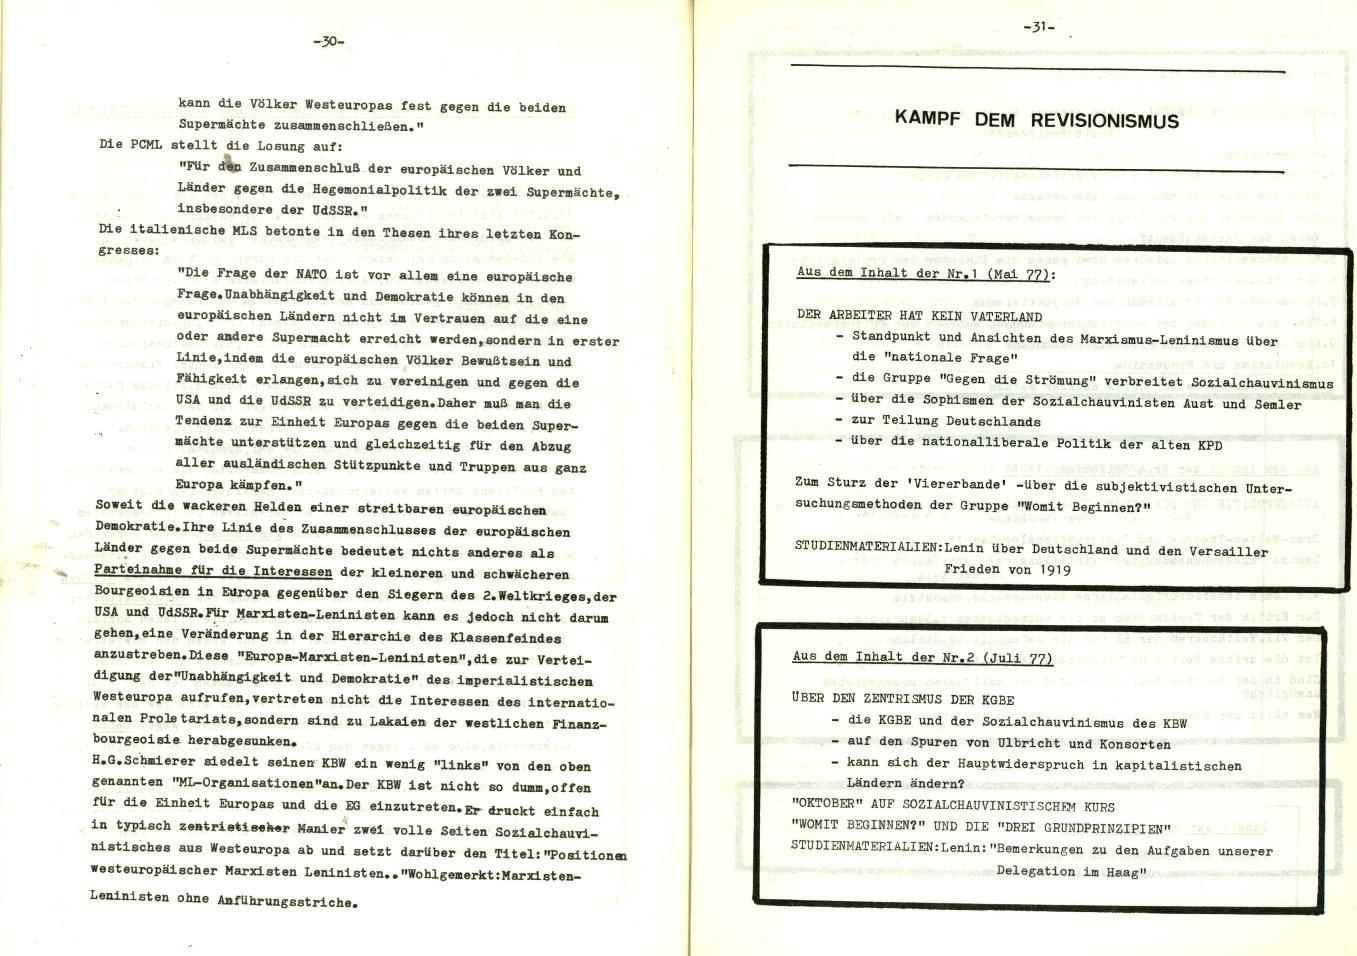 Muenchen_Kampf_dem_Revisionismus_1979_10_16